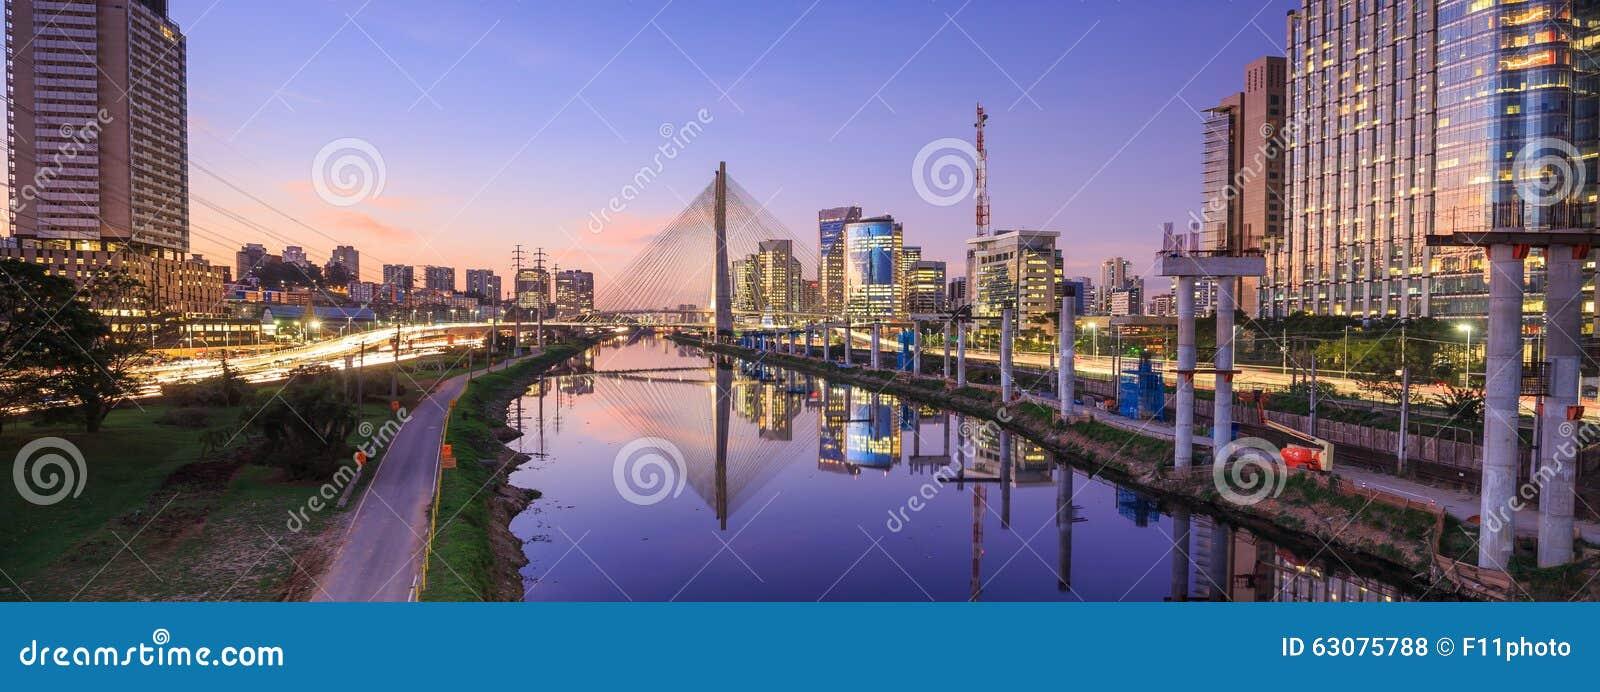 Download Octavio Frias De Oliveira Bridge Dans Le Sao Paulo Brazil Photo stock - Image du ciel, futuriste: 63075788